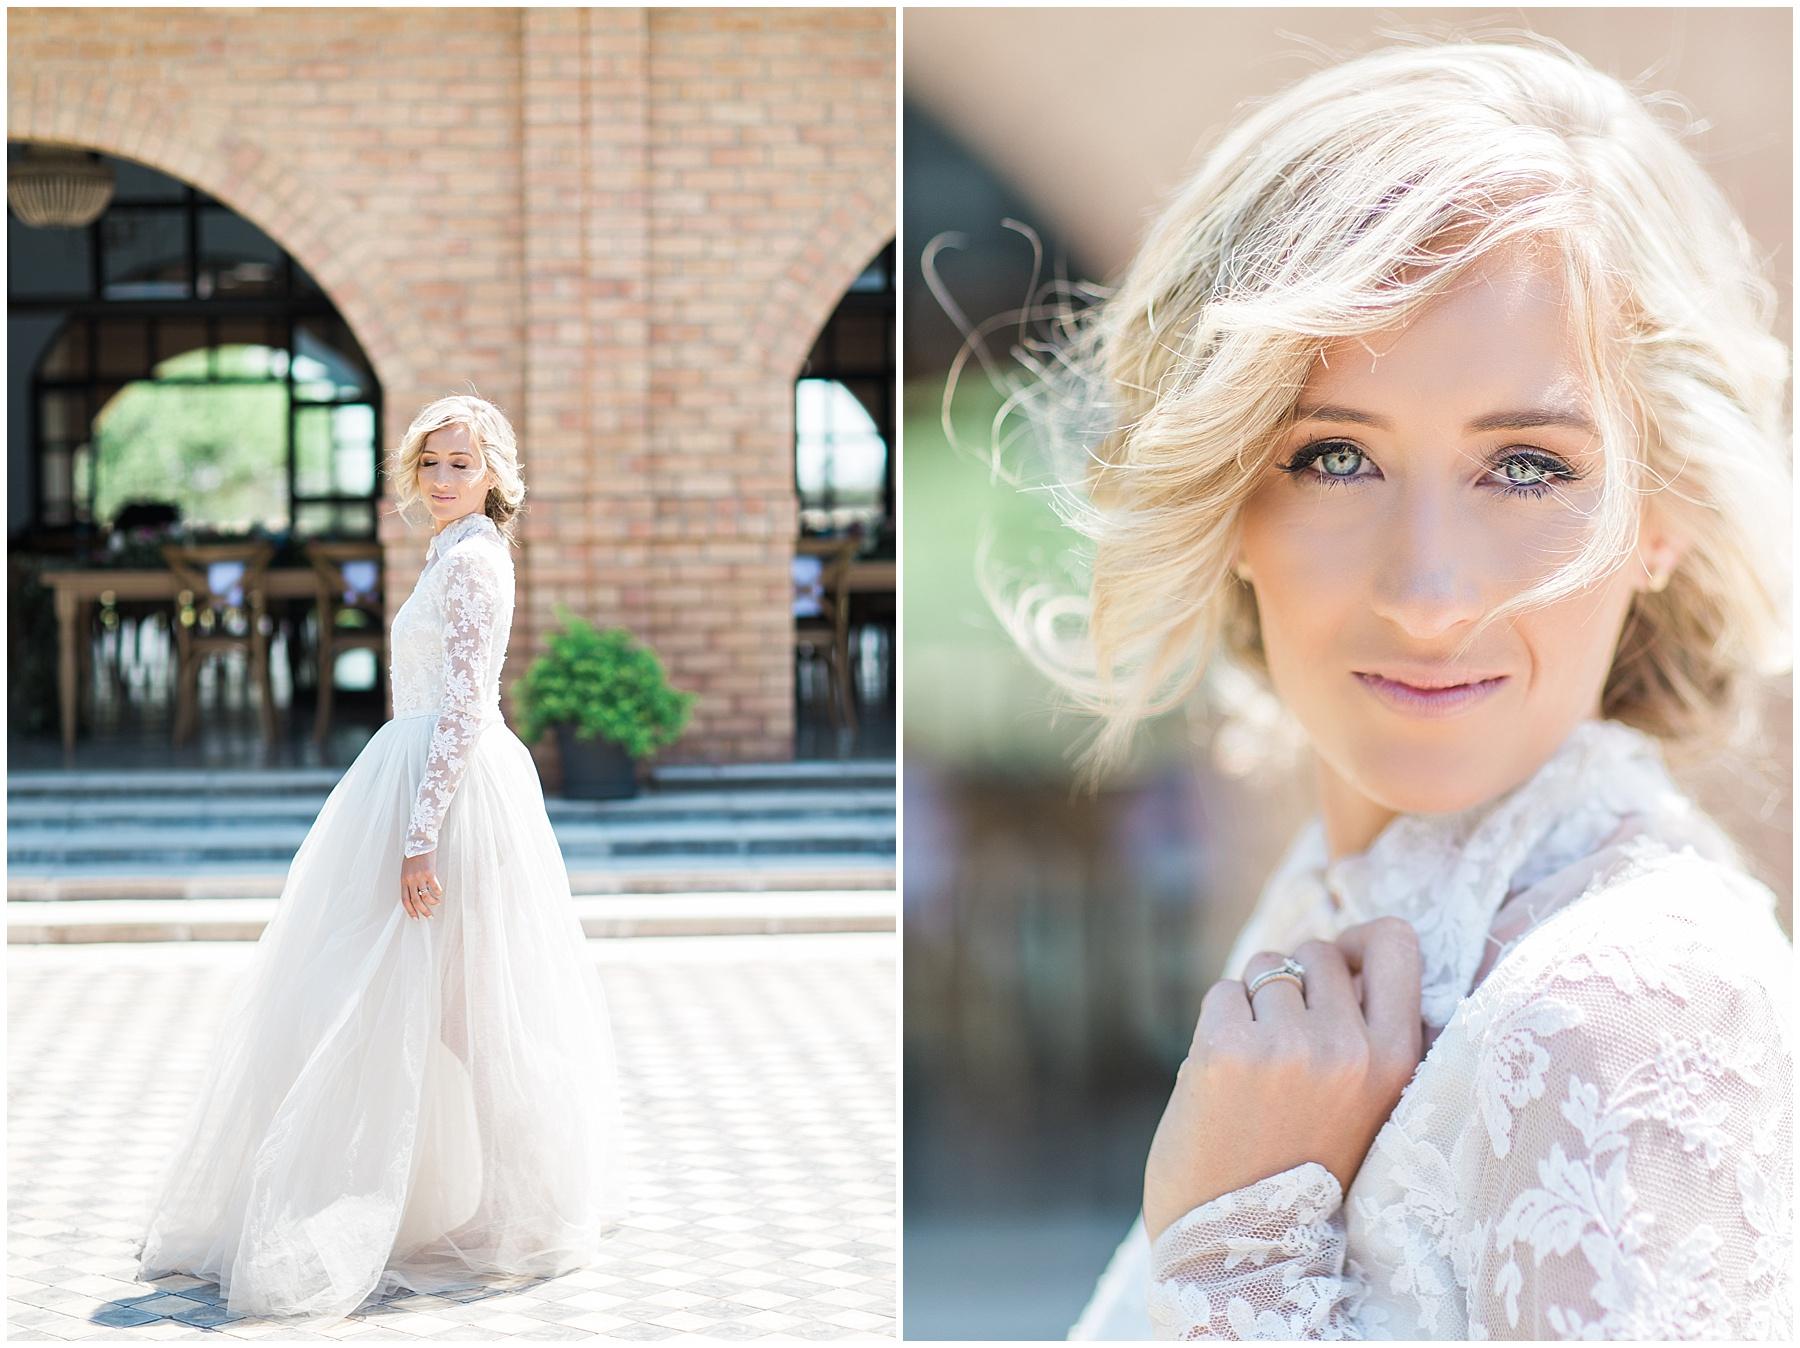 AliciaLandman_JoleneandZander_Wedding_The Pretty Blog_0441.jpg